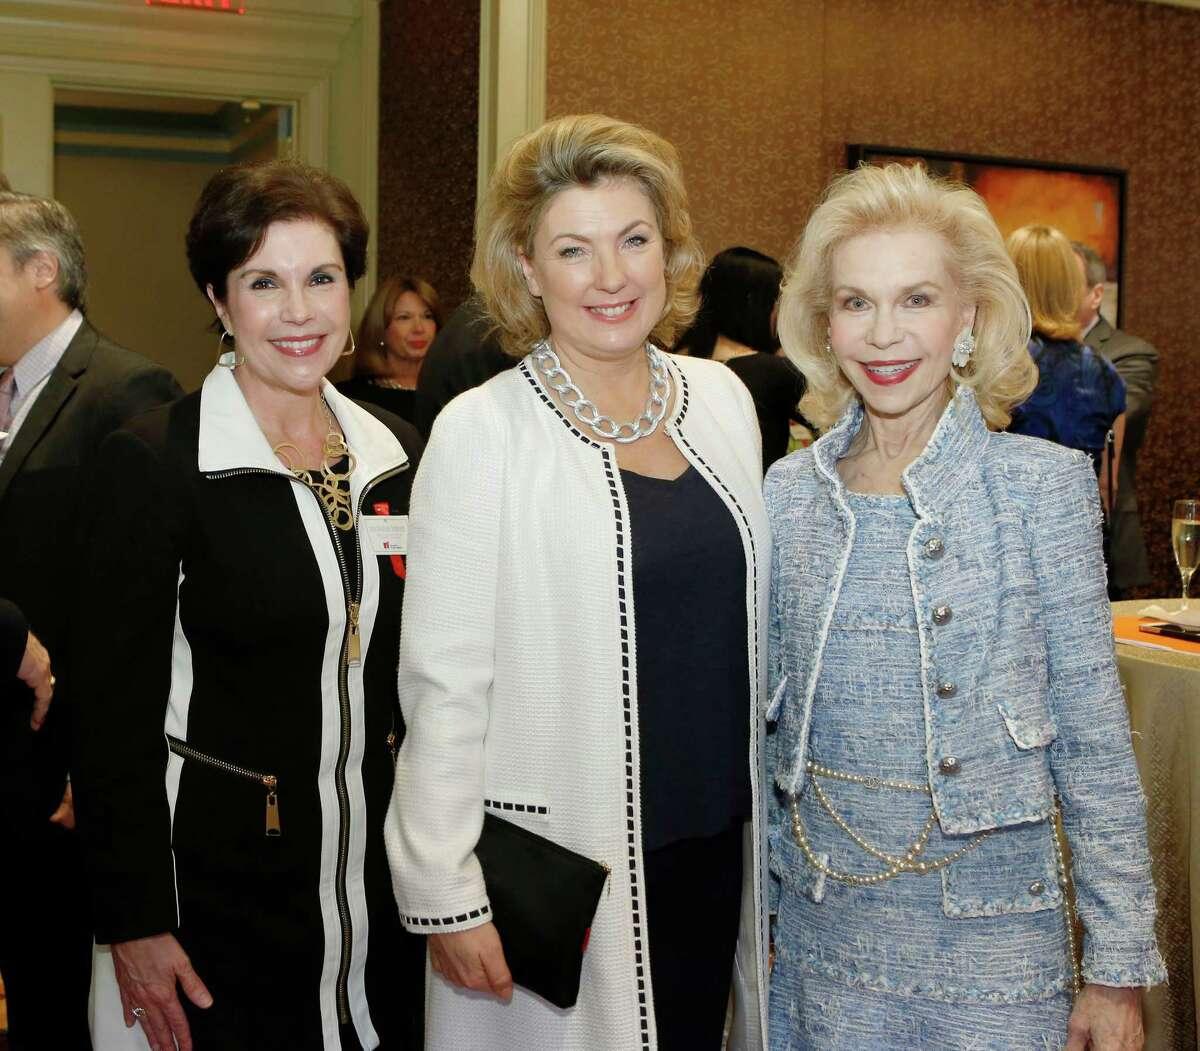 Lisa Shumate, Chair, Lady Fiona Carnarvon and Lynn Wyatt at Highclere Tea at St. Regis.